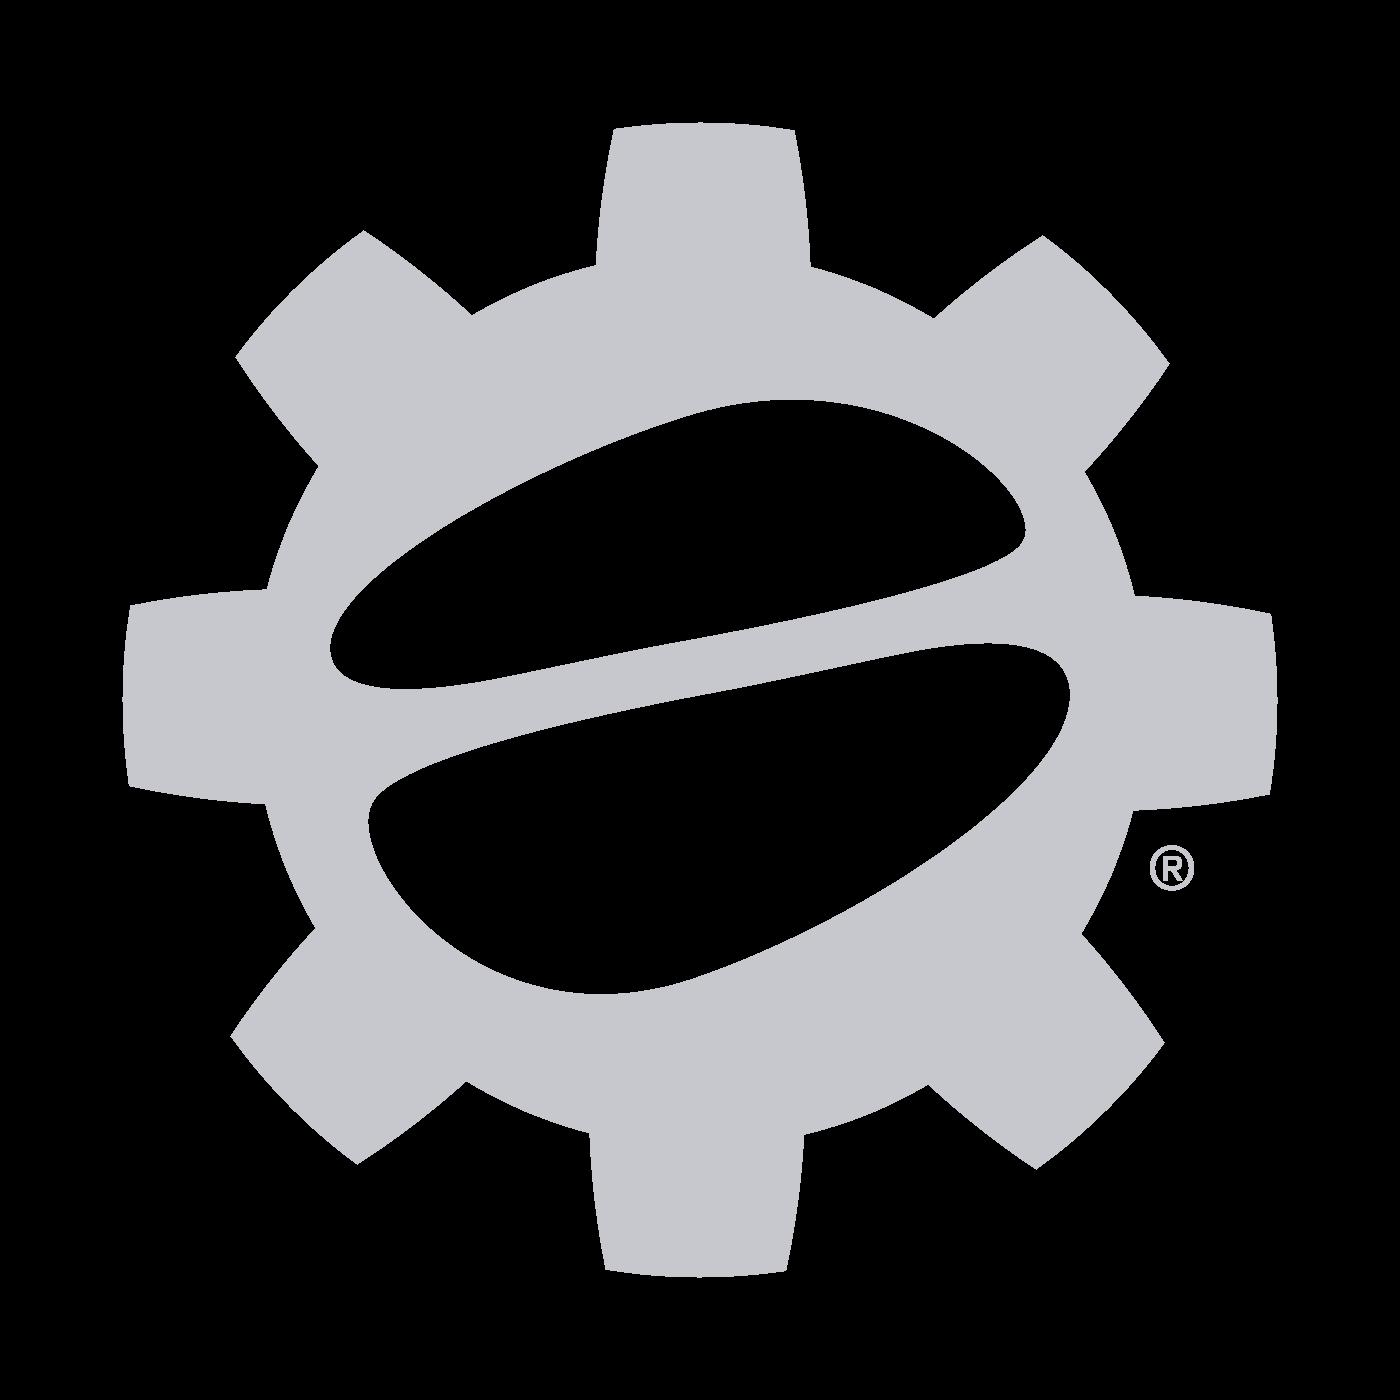 Saeco Minuto Focus Automatic Espresso Machine & Coffee Maker - Certified Refurbished